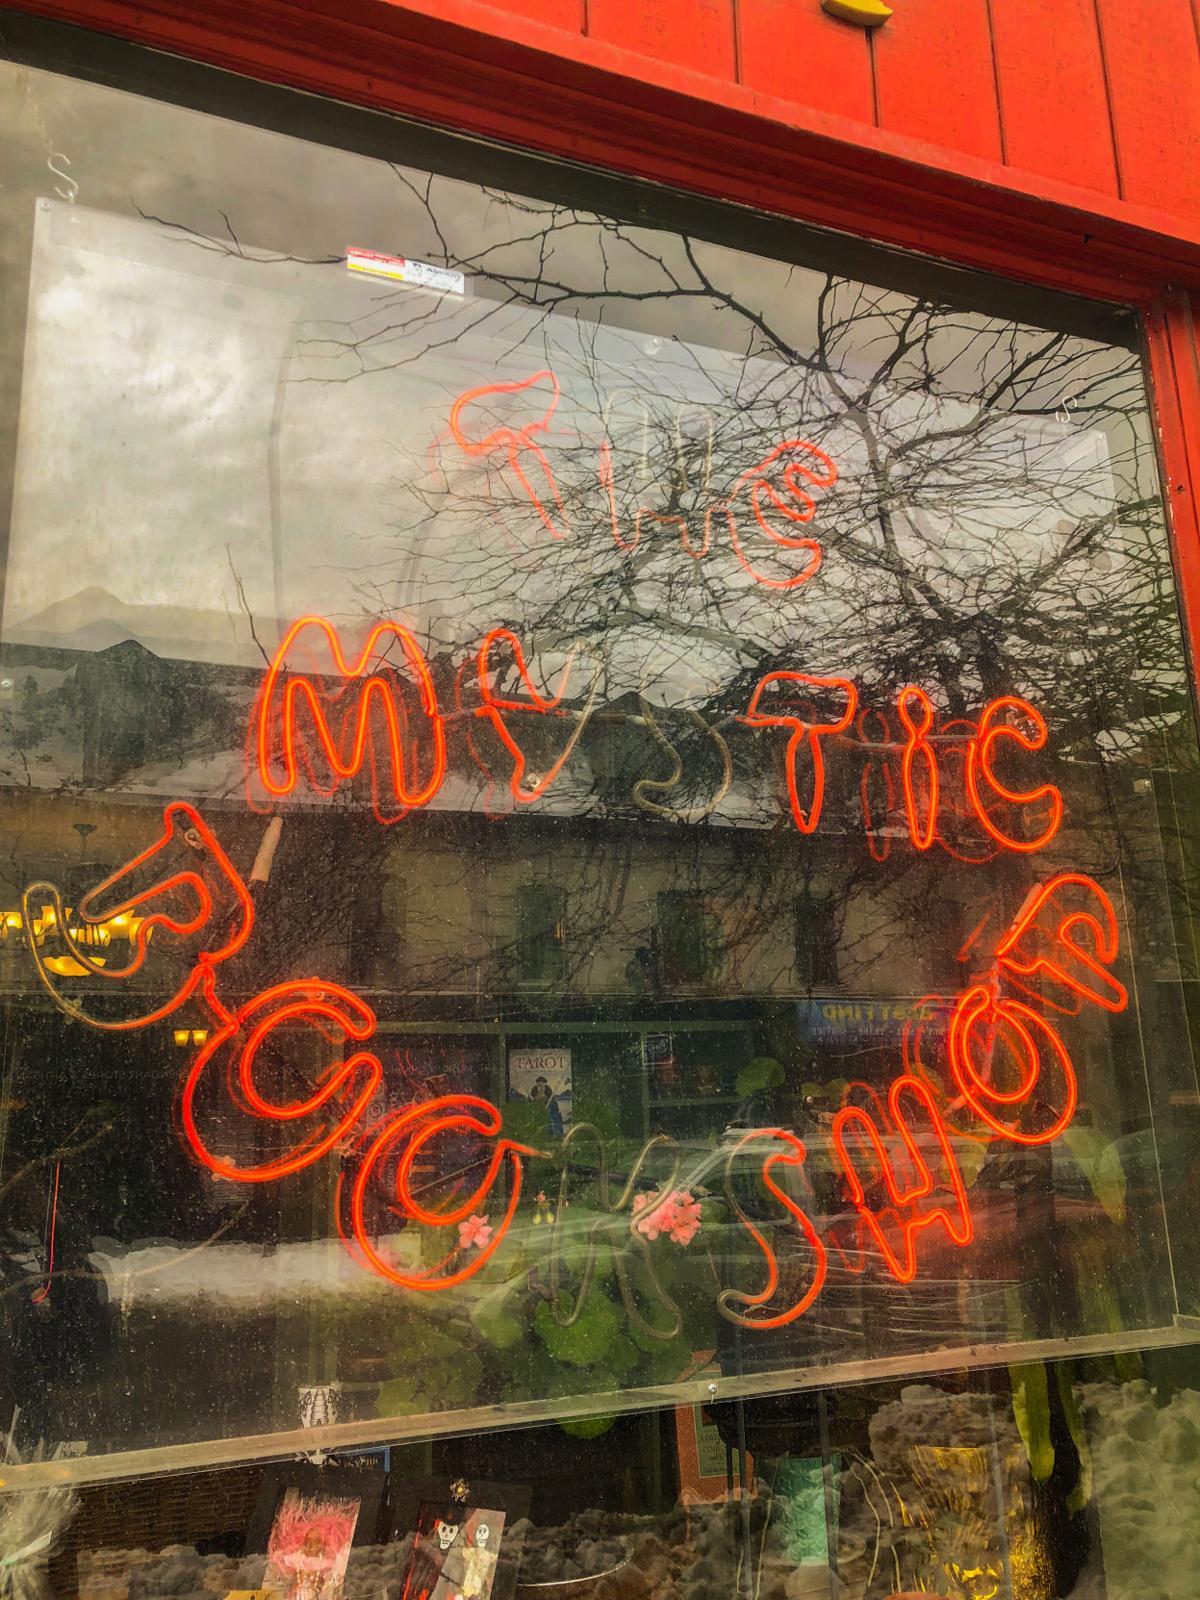 Bookshops in London - Safiya Chagani Mystic Bookshop sign (10 of 10).jpg